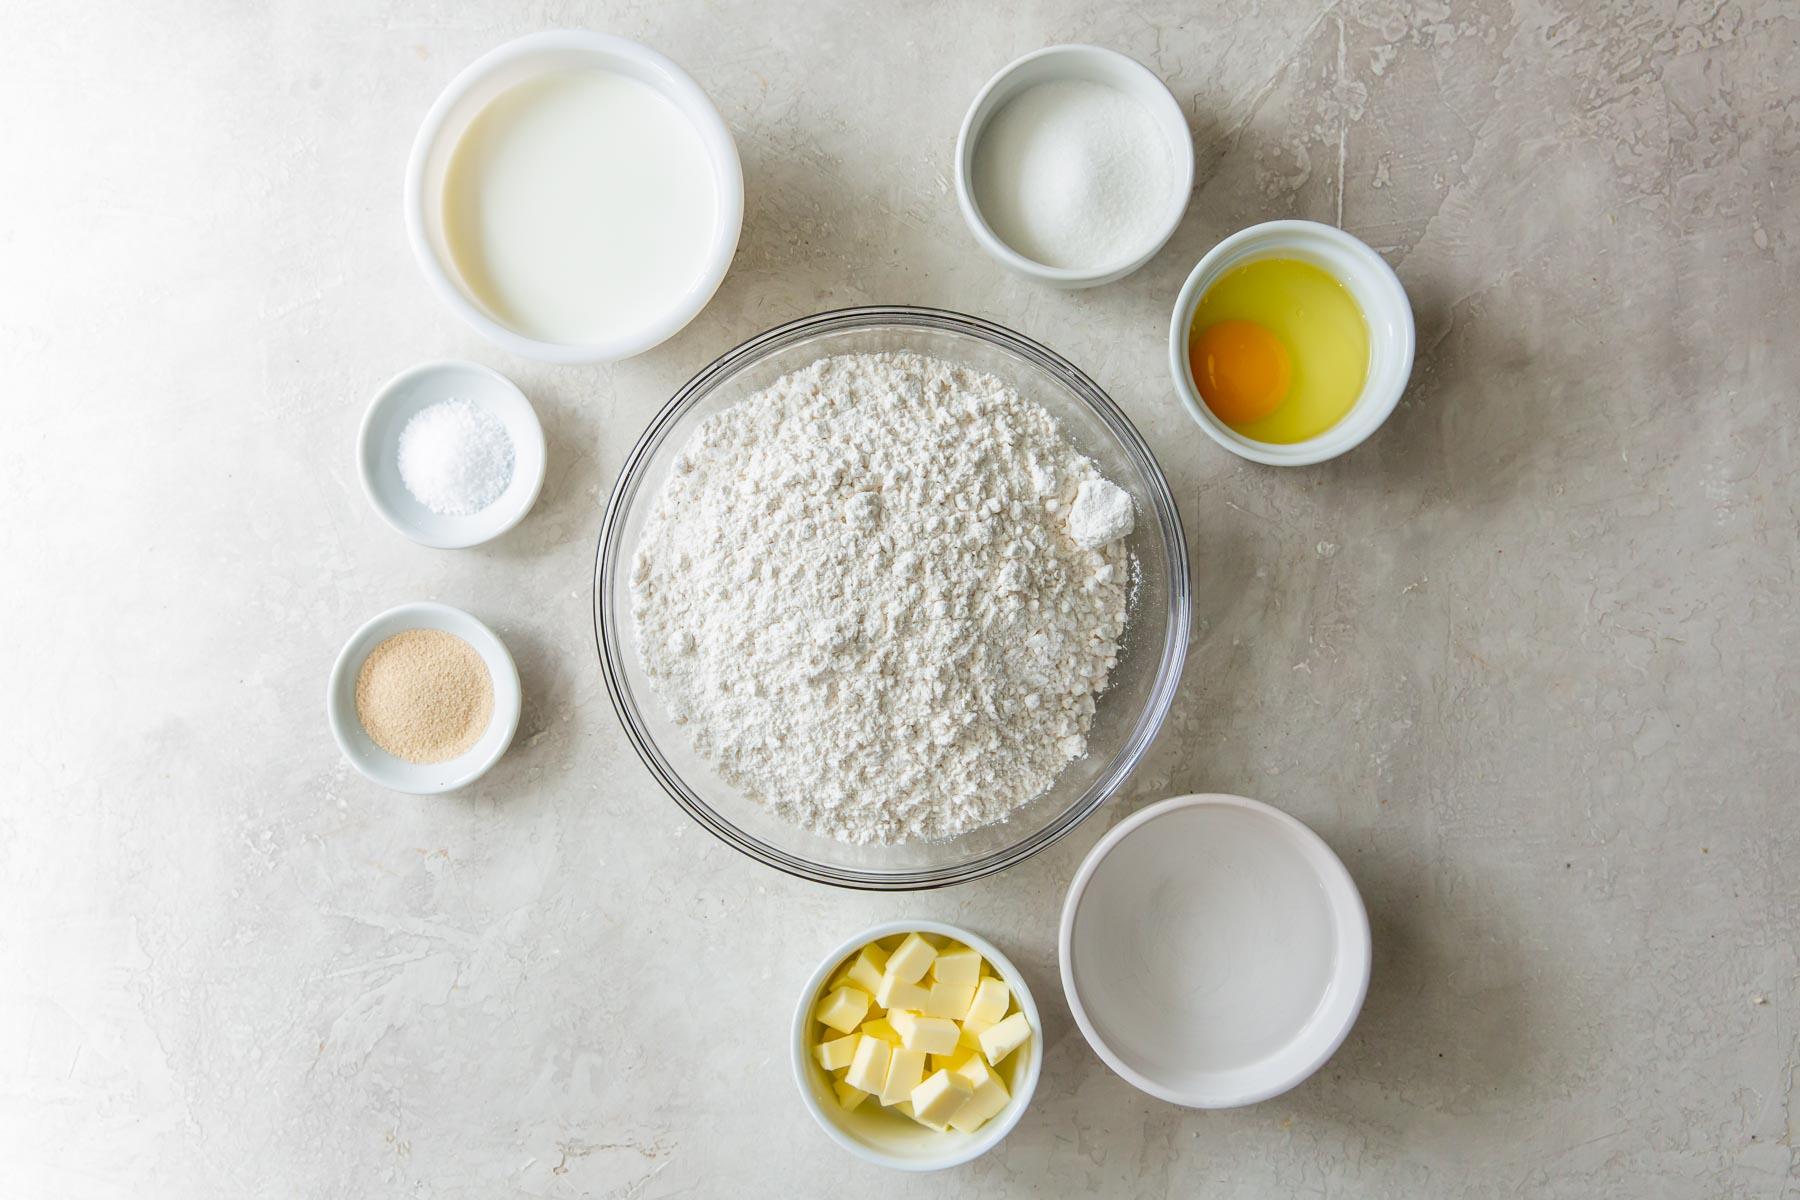 ingredients for dinner rolls recipe